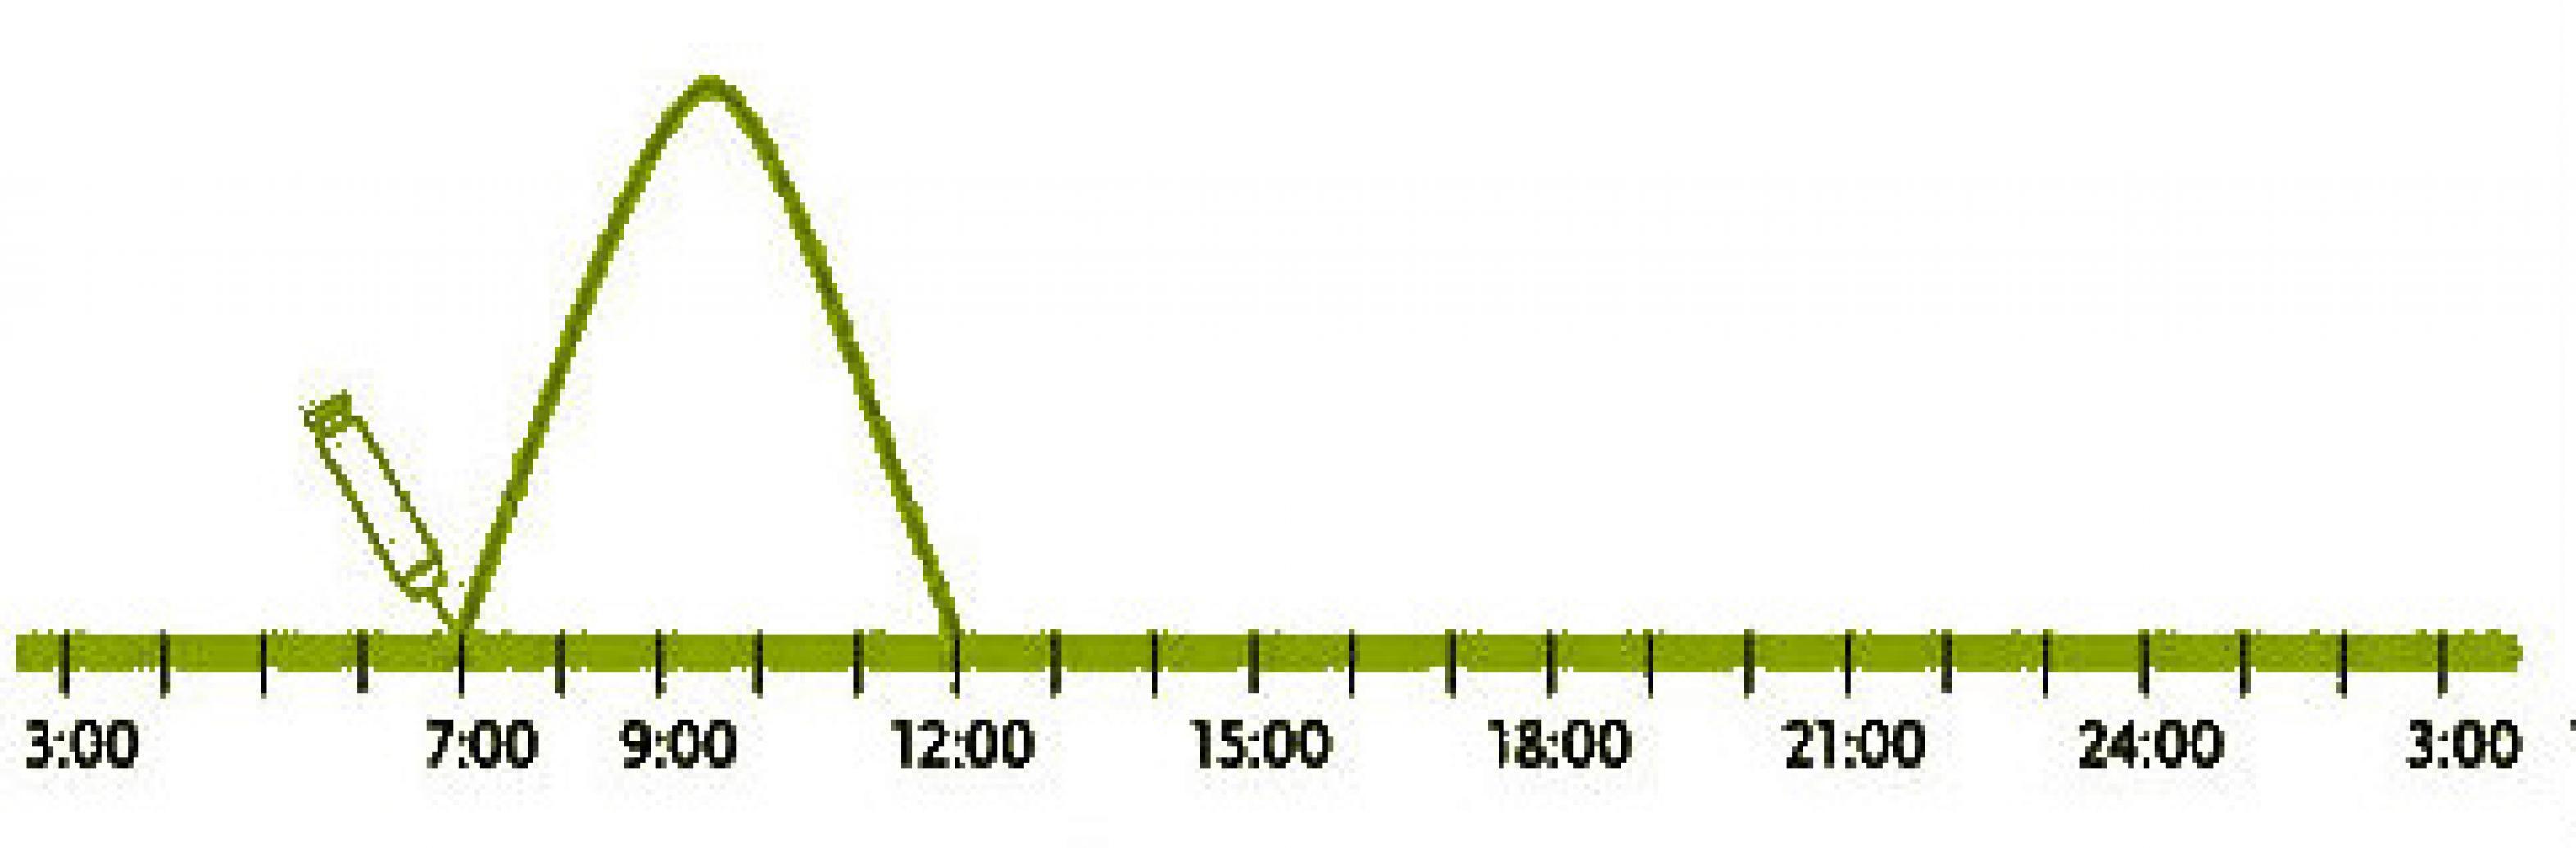 Grafik Kurve Kurzwirksame Normalinsuline